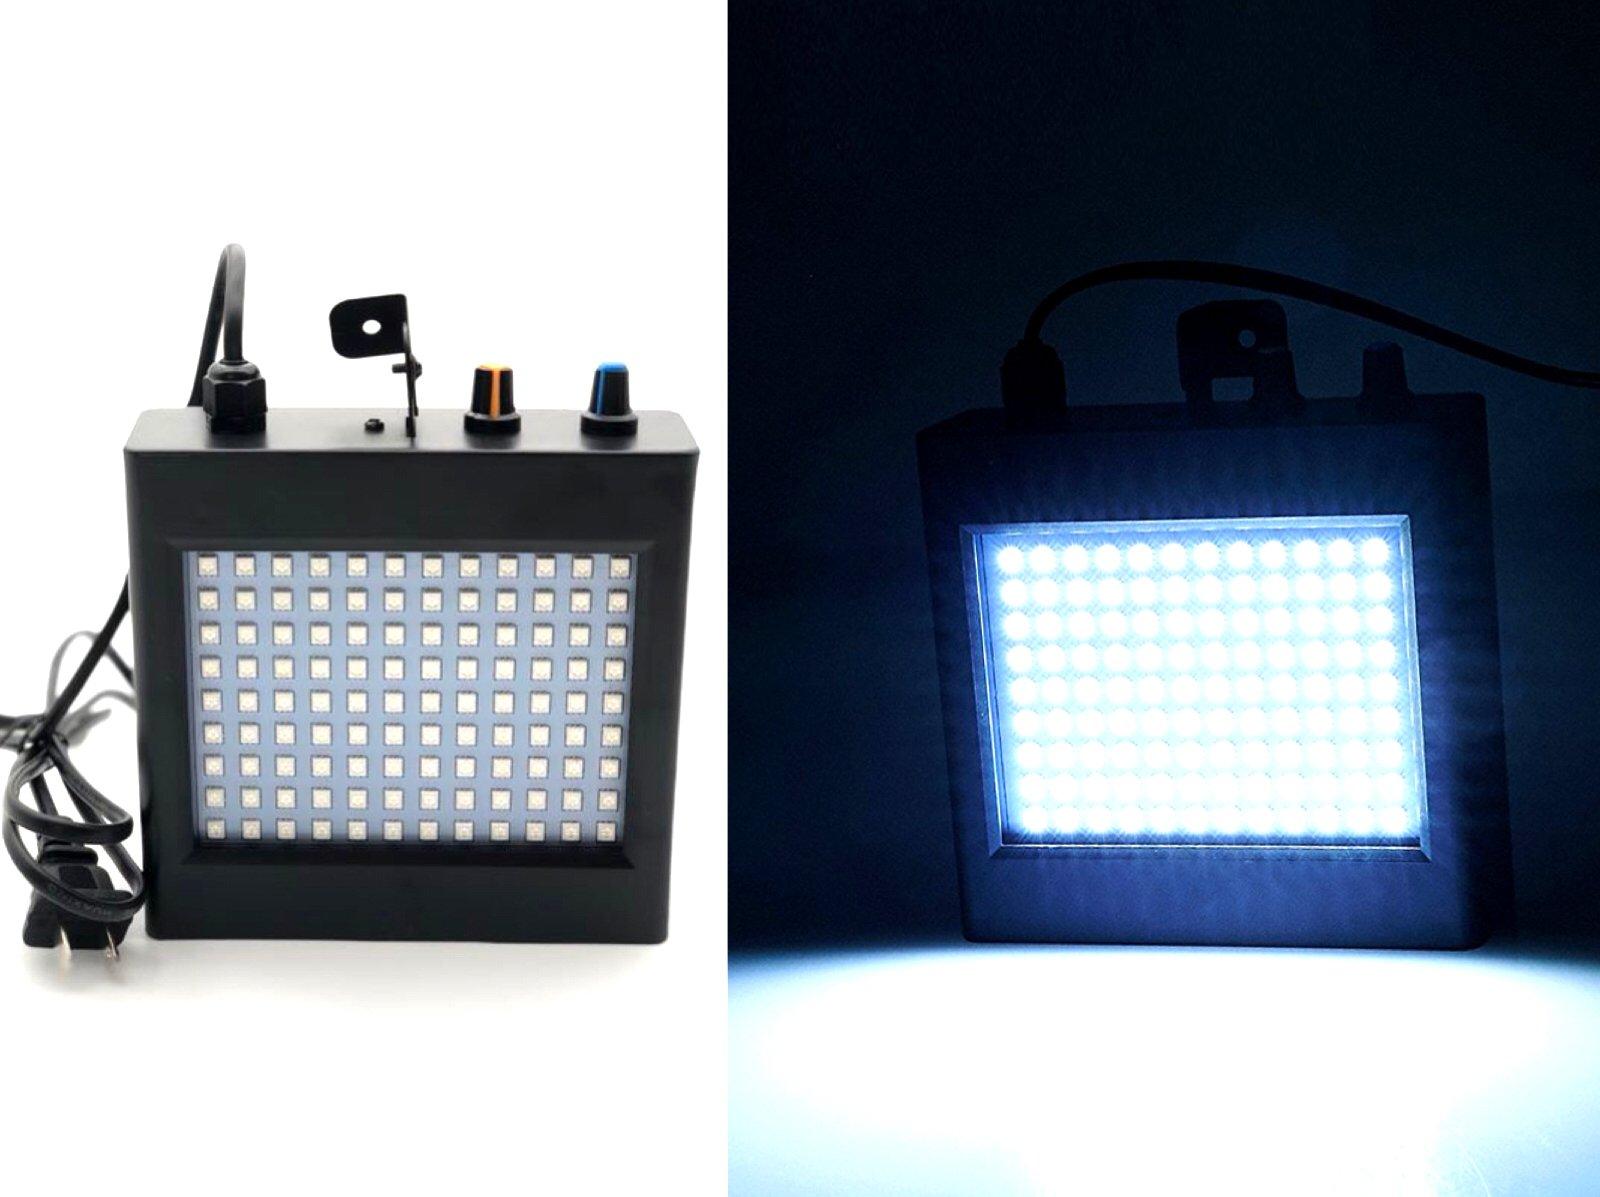 Pulse Strobe Light 108 White LED Auto Sound Activated Mode Adjustable Flash Speed Control 25W by zaytoner